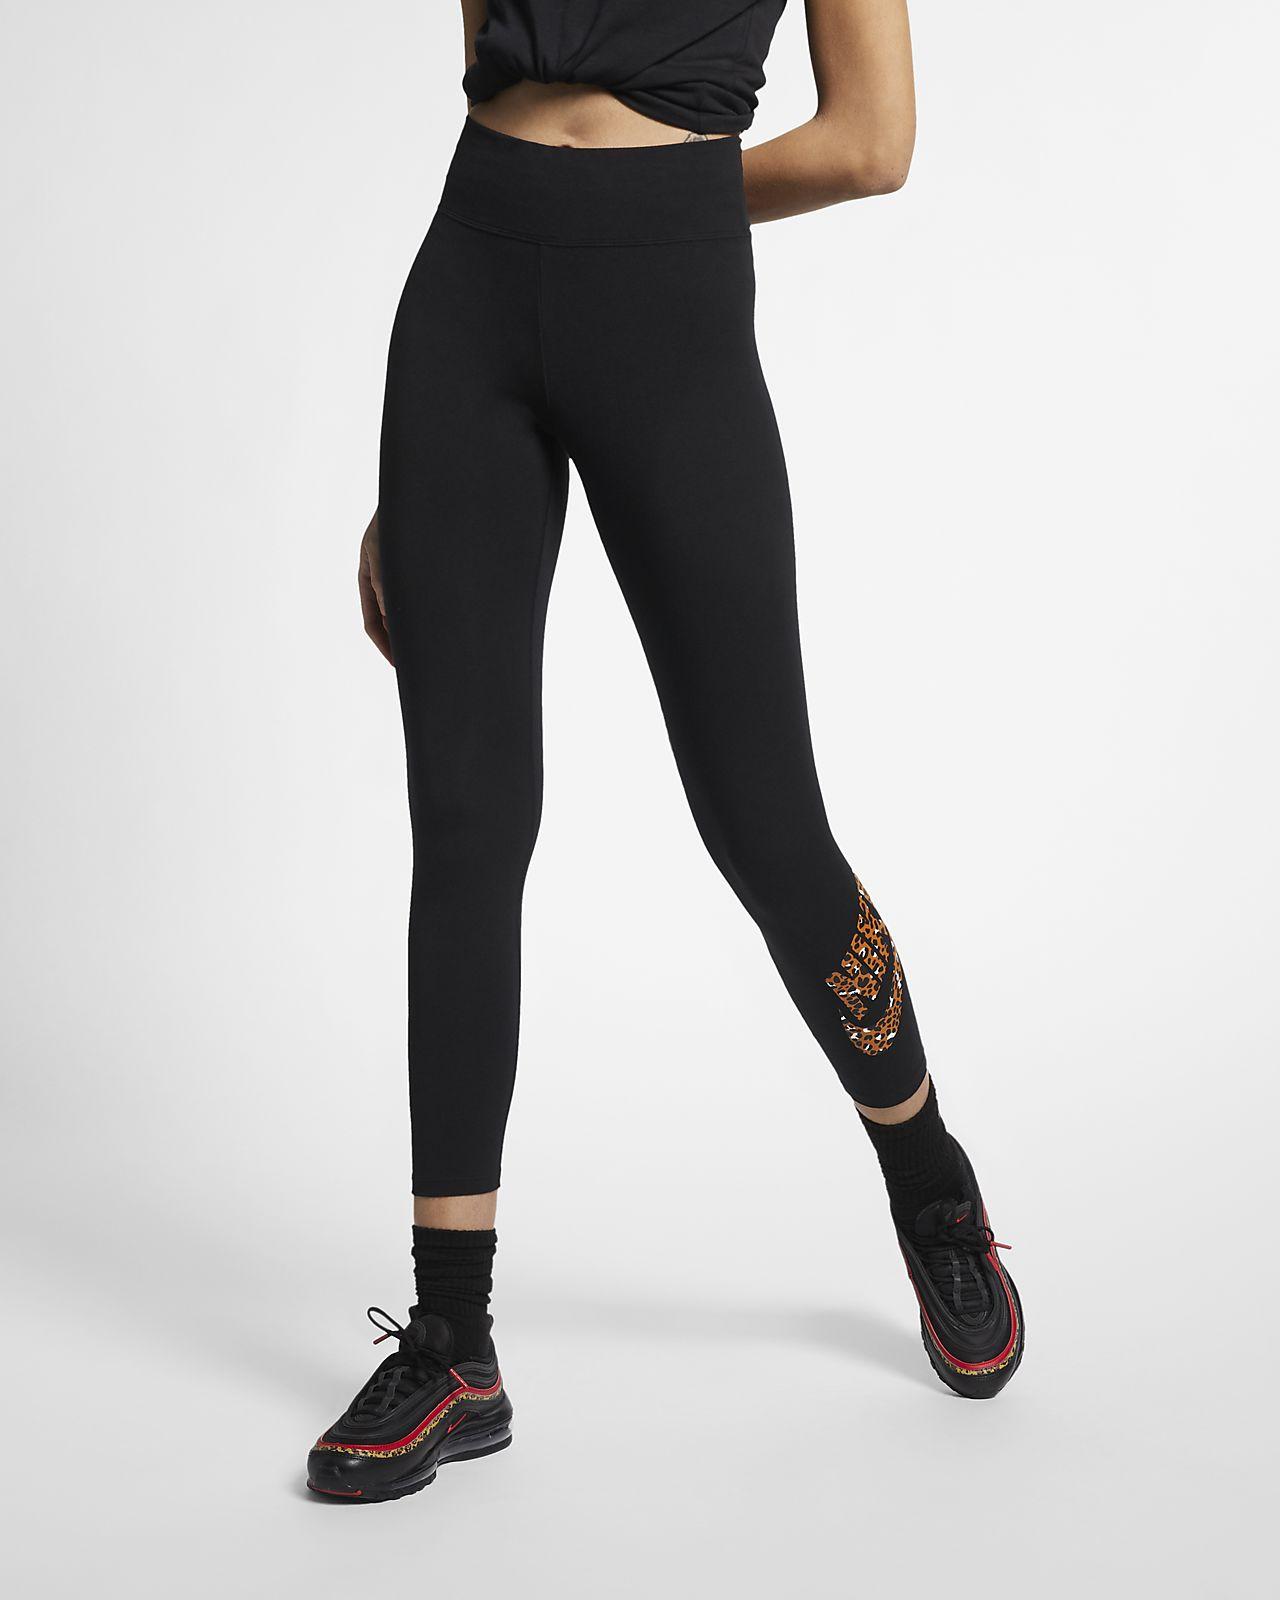 Legging Nike Sportswear Animal Print pour Femme